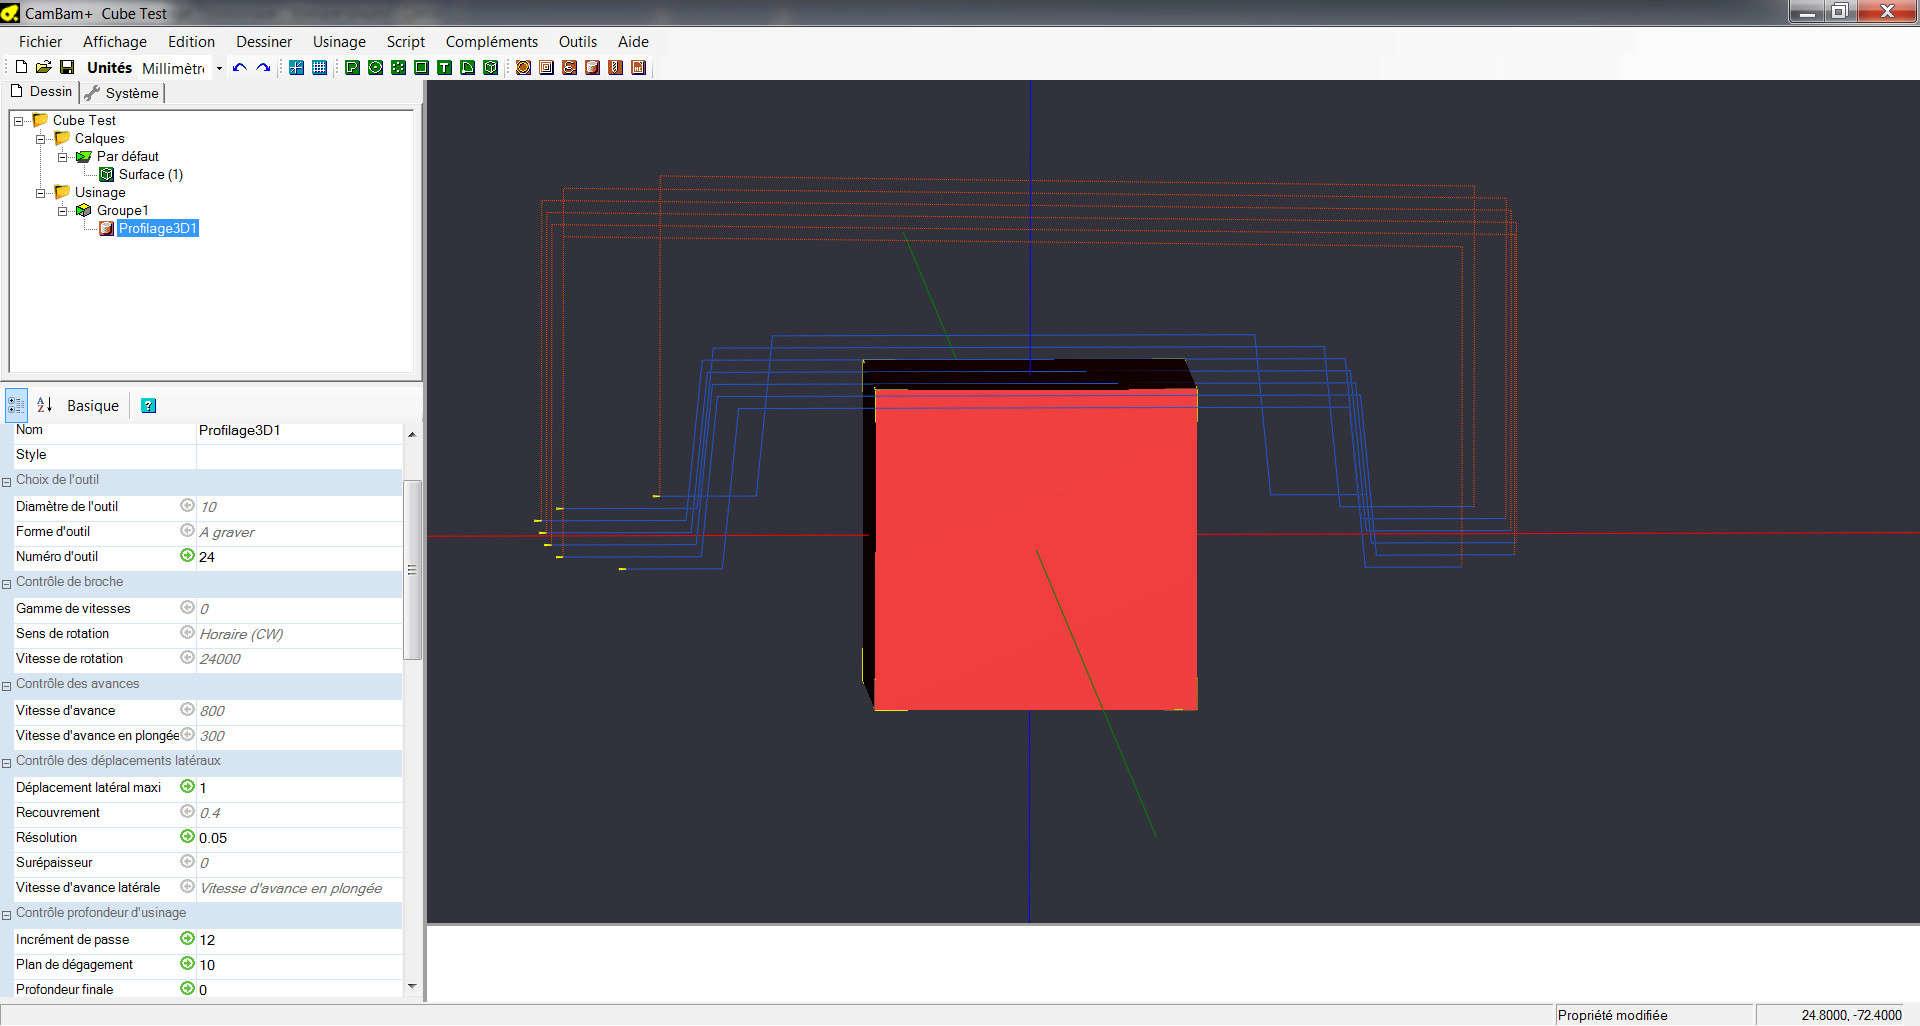 Cambam, CutViewer et gestion d'outils Test_f11